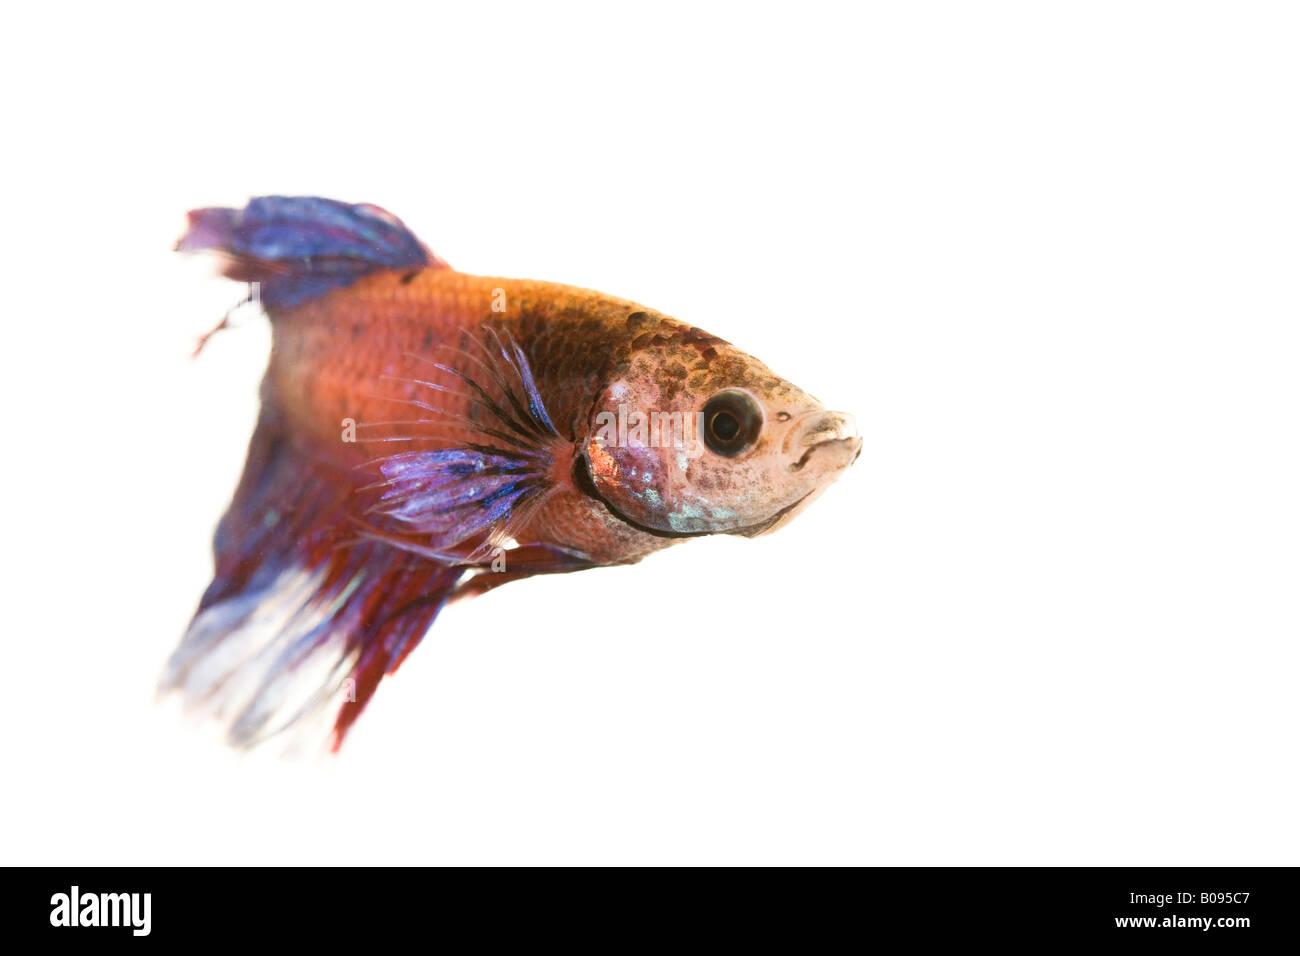 Siamese Fighting Fish, male (Betta splendens) Stock Photo